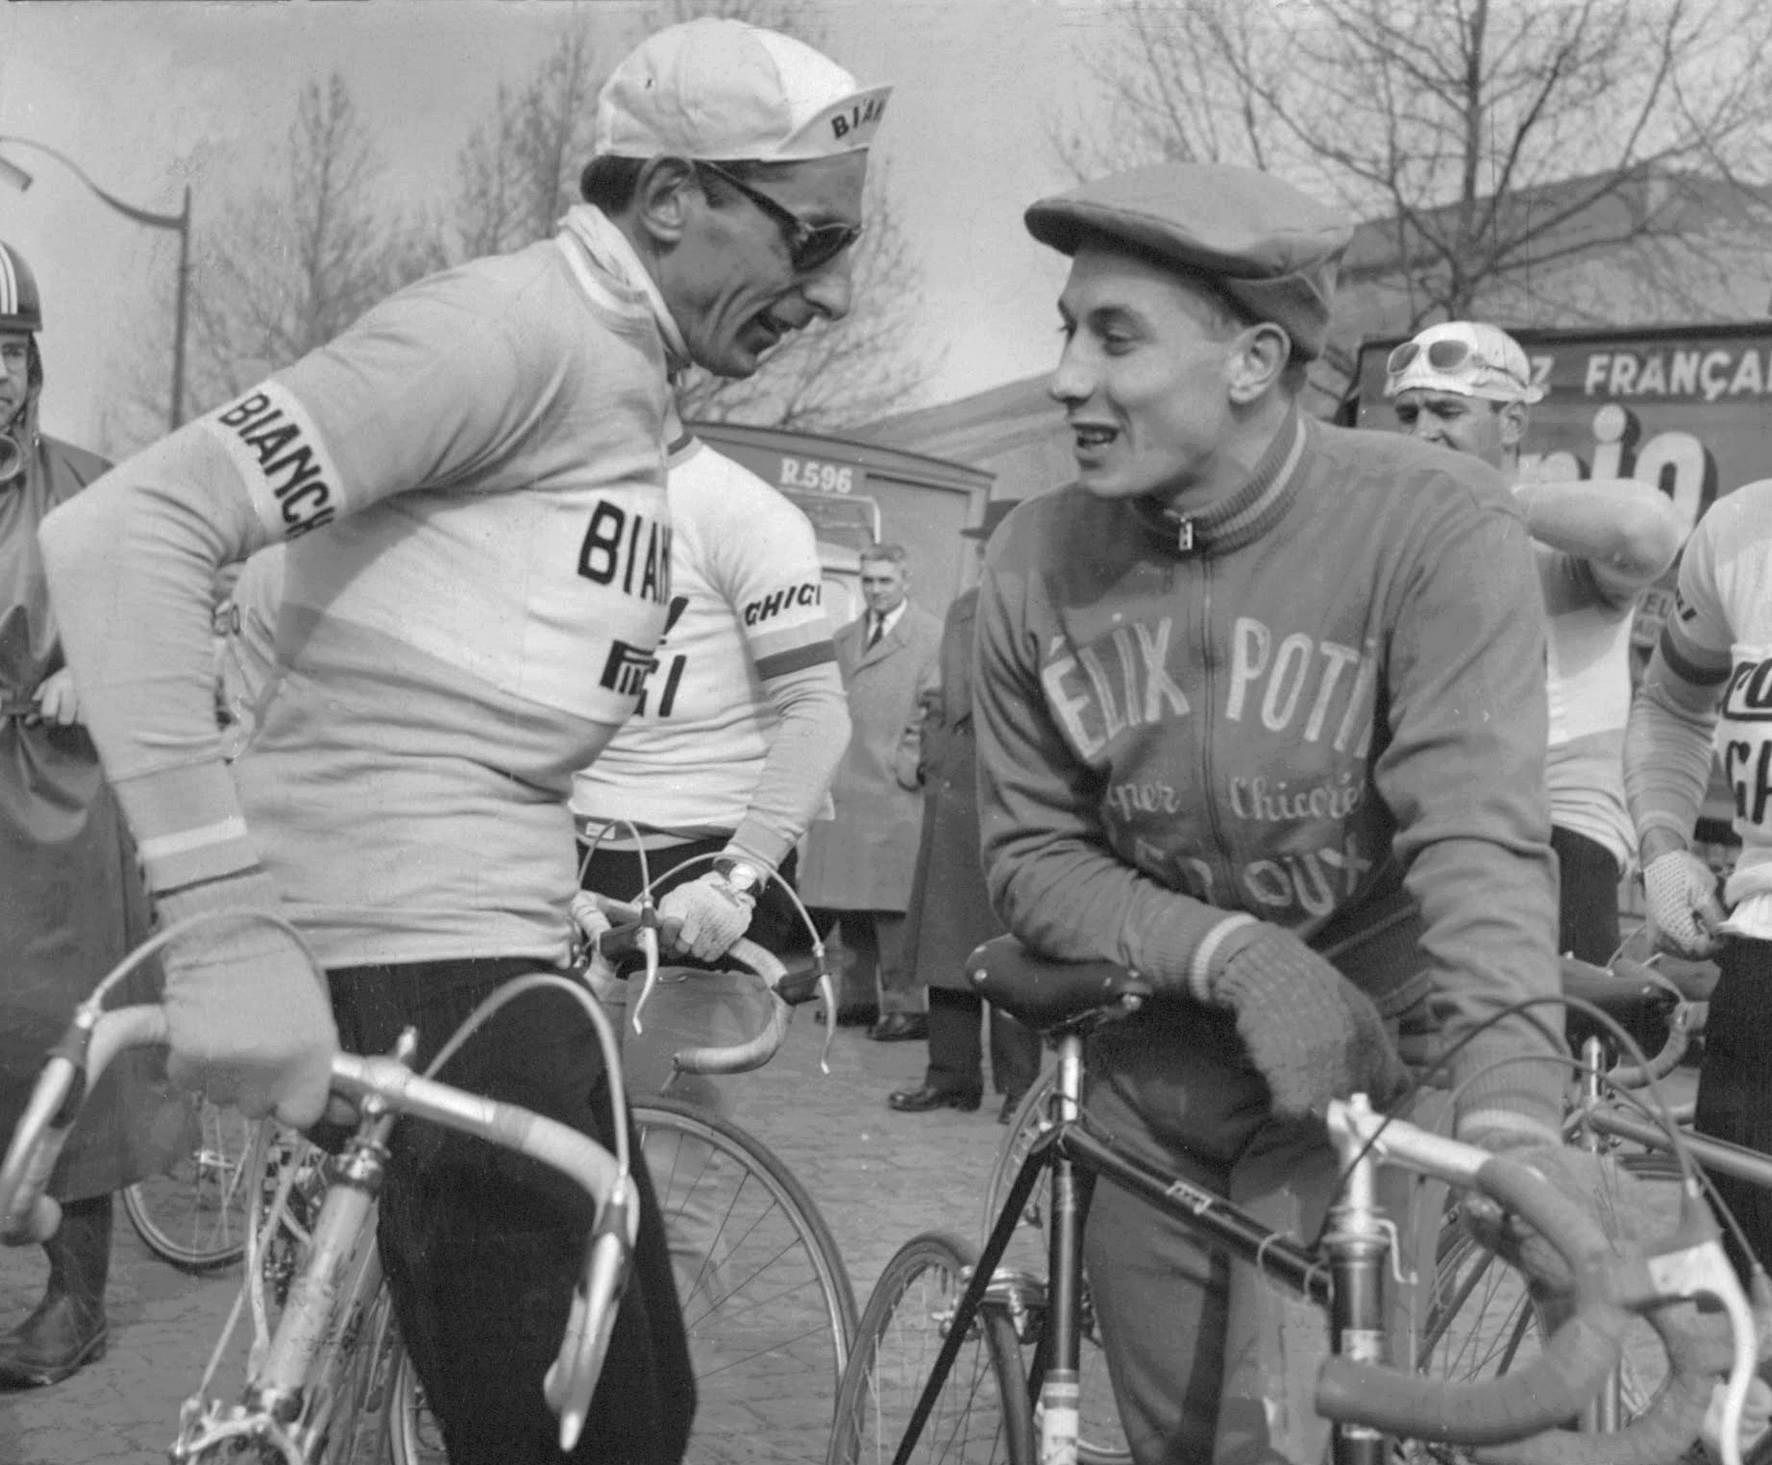 coppi und Anquetil 1958 Paris Nizza.jpg